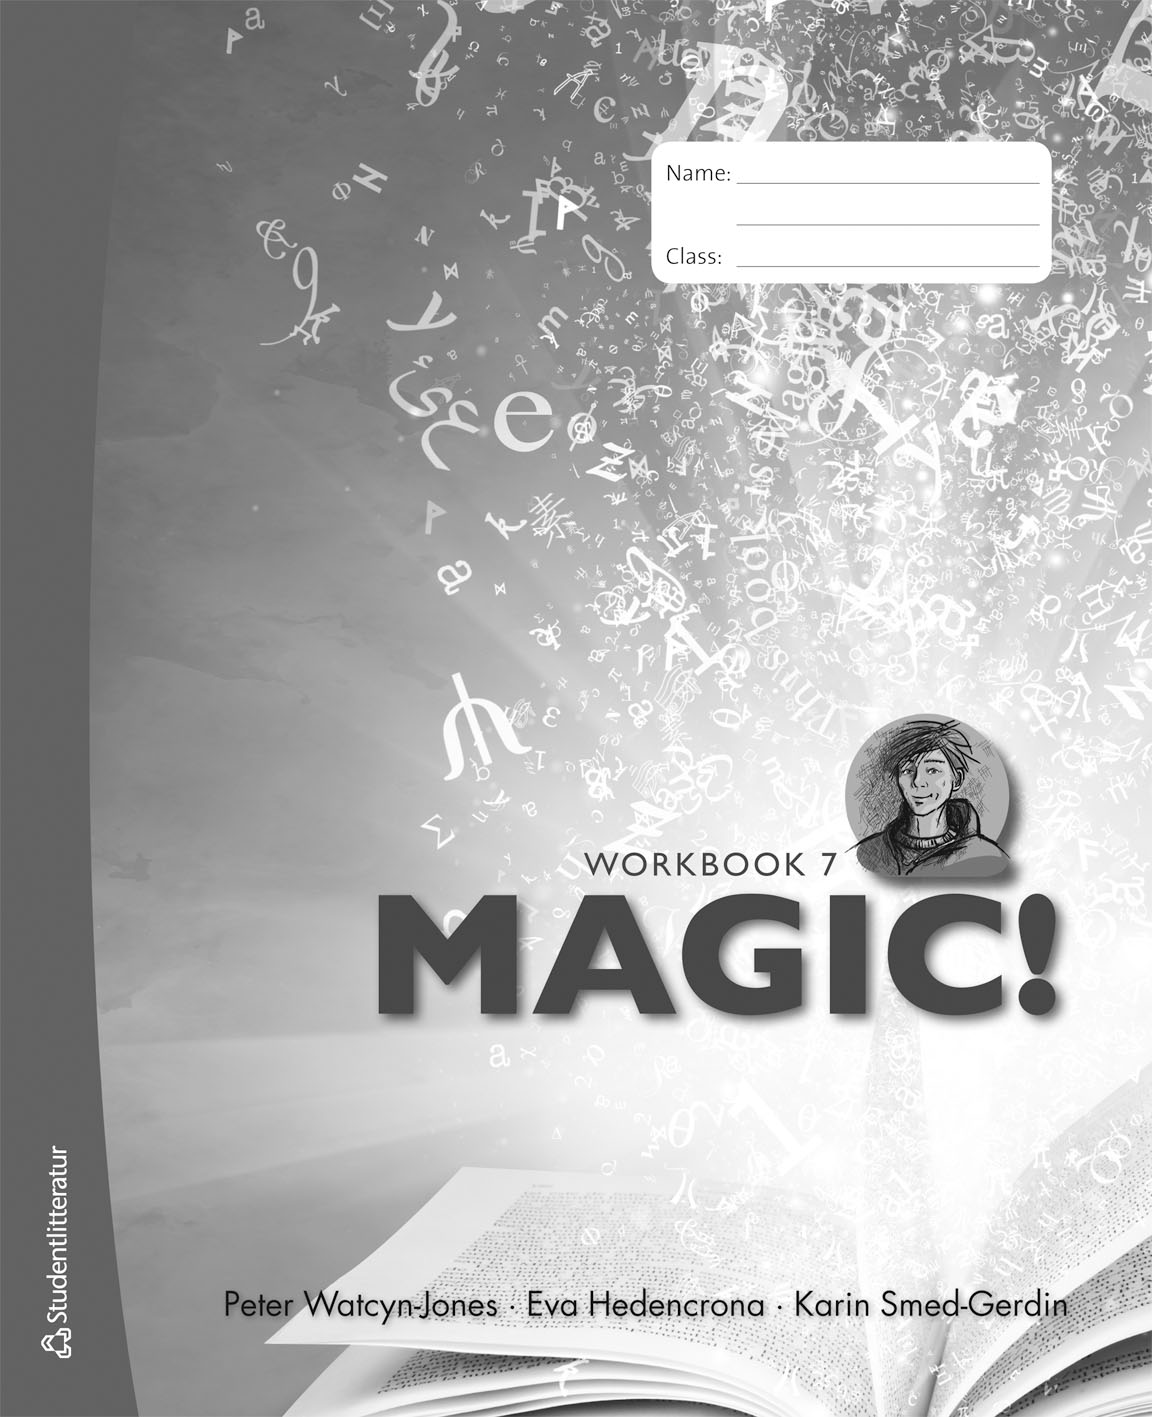 Magic Workbook 7.